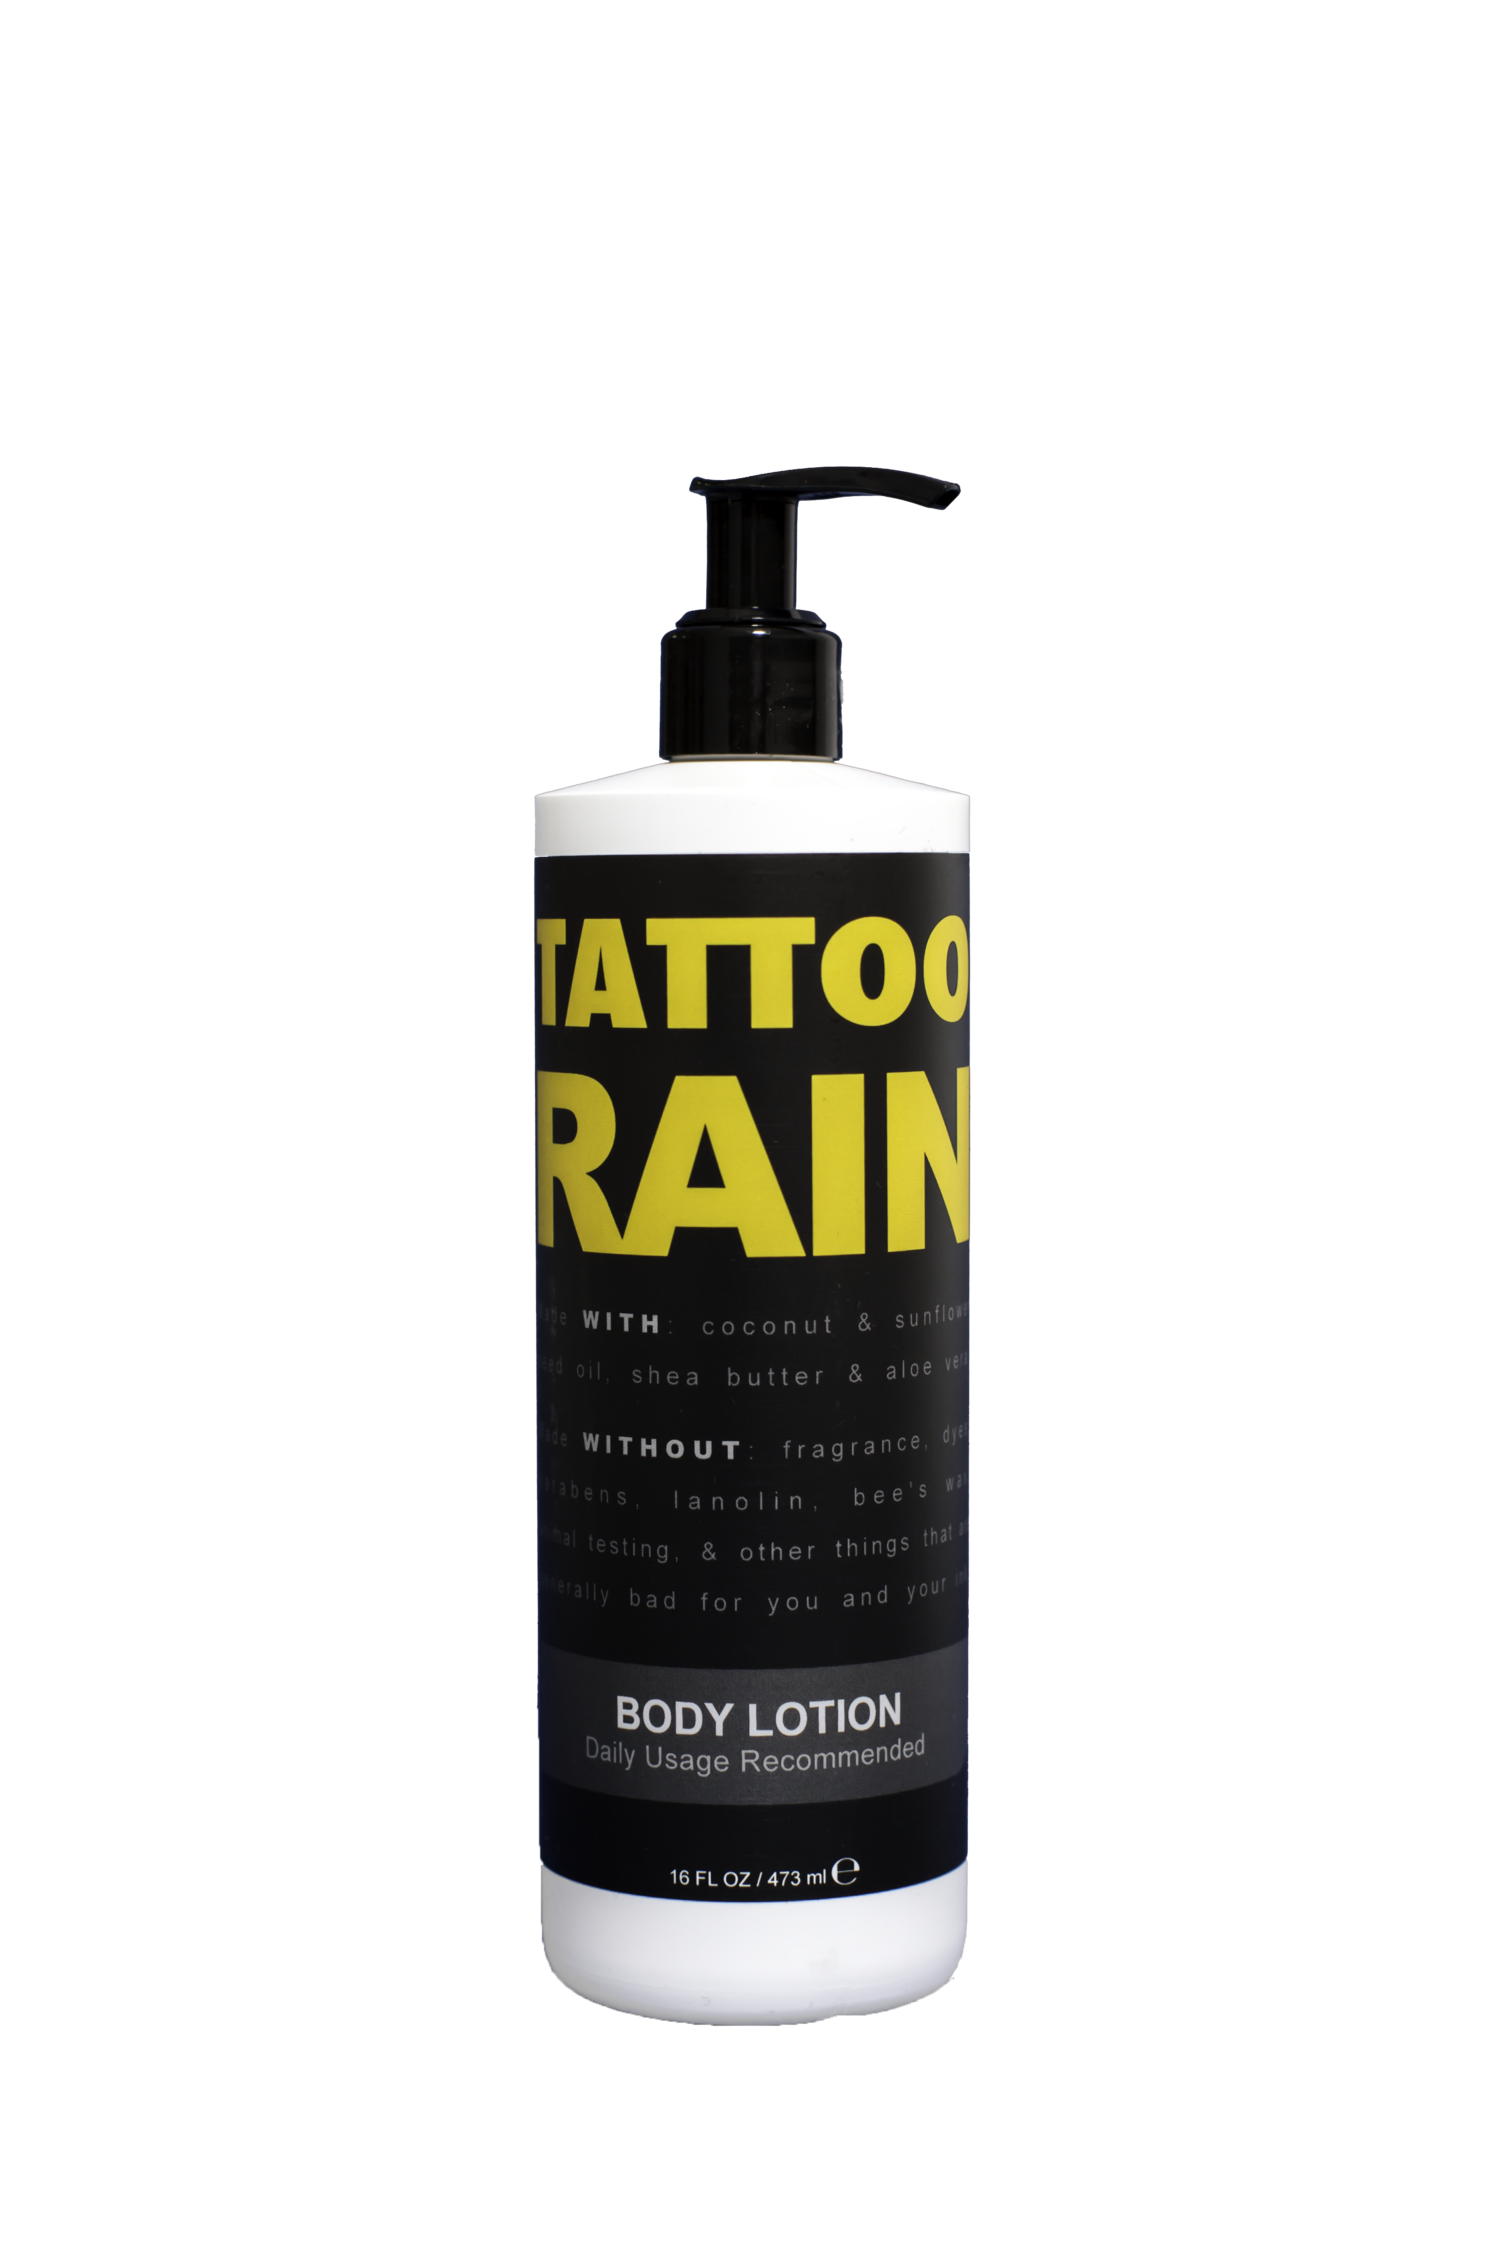 Tattoo Rain Body Lotion — Okoboji Skin Care